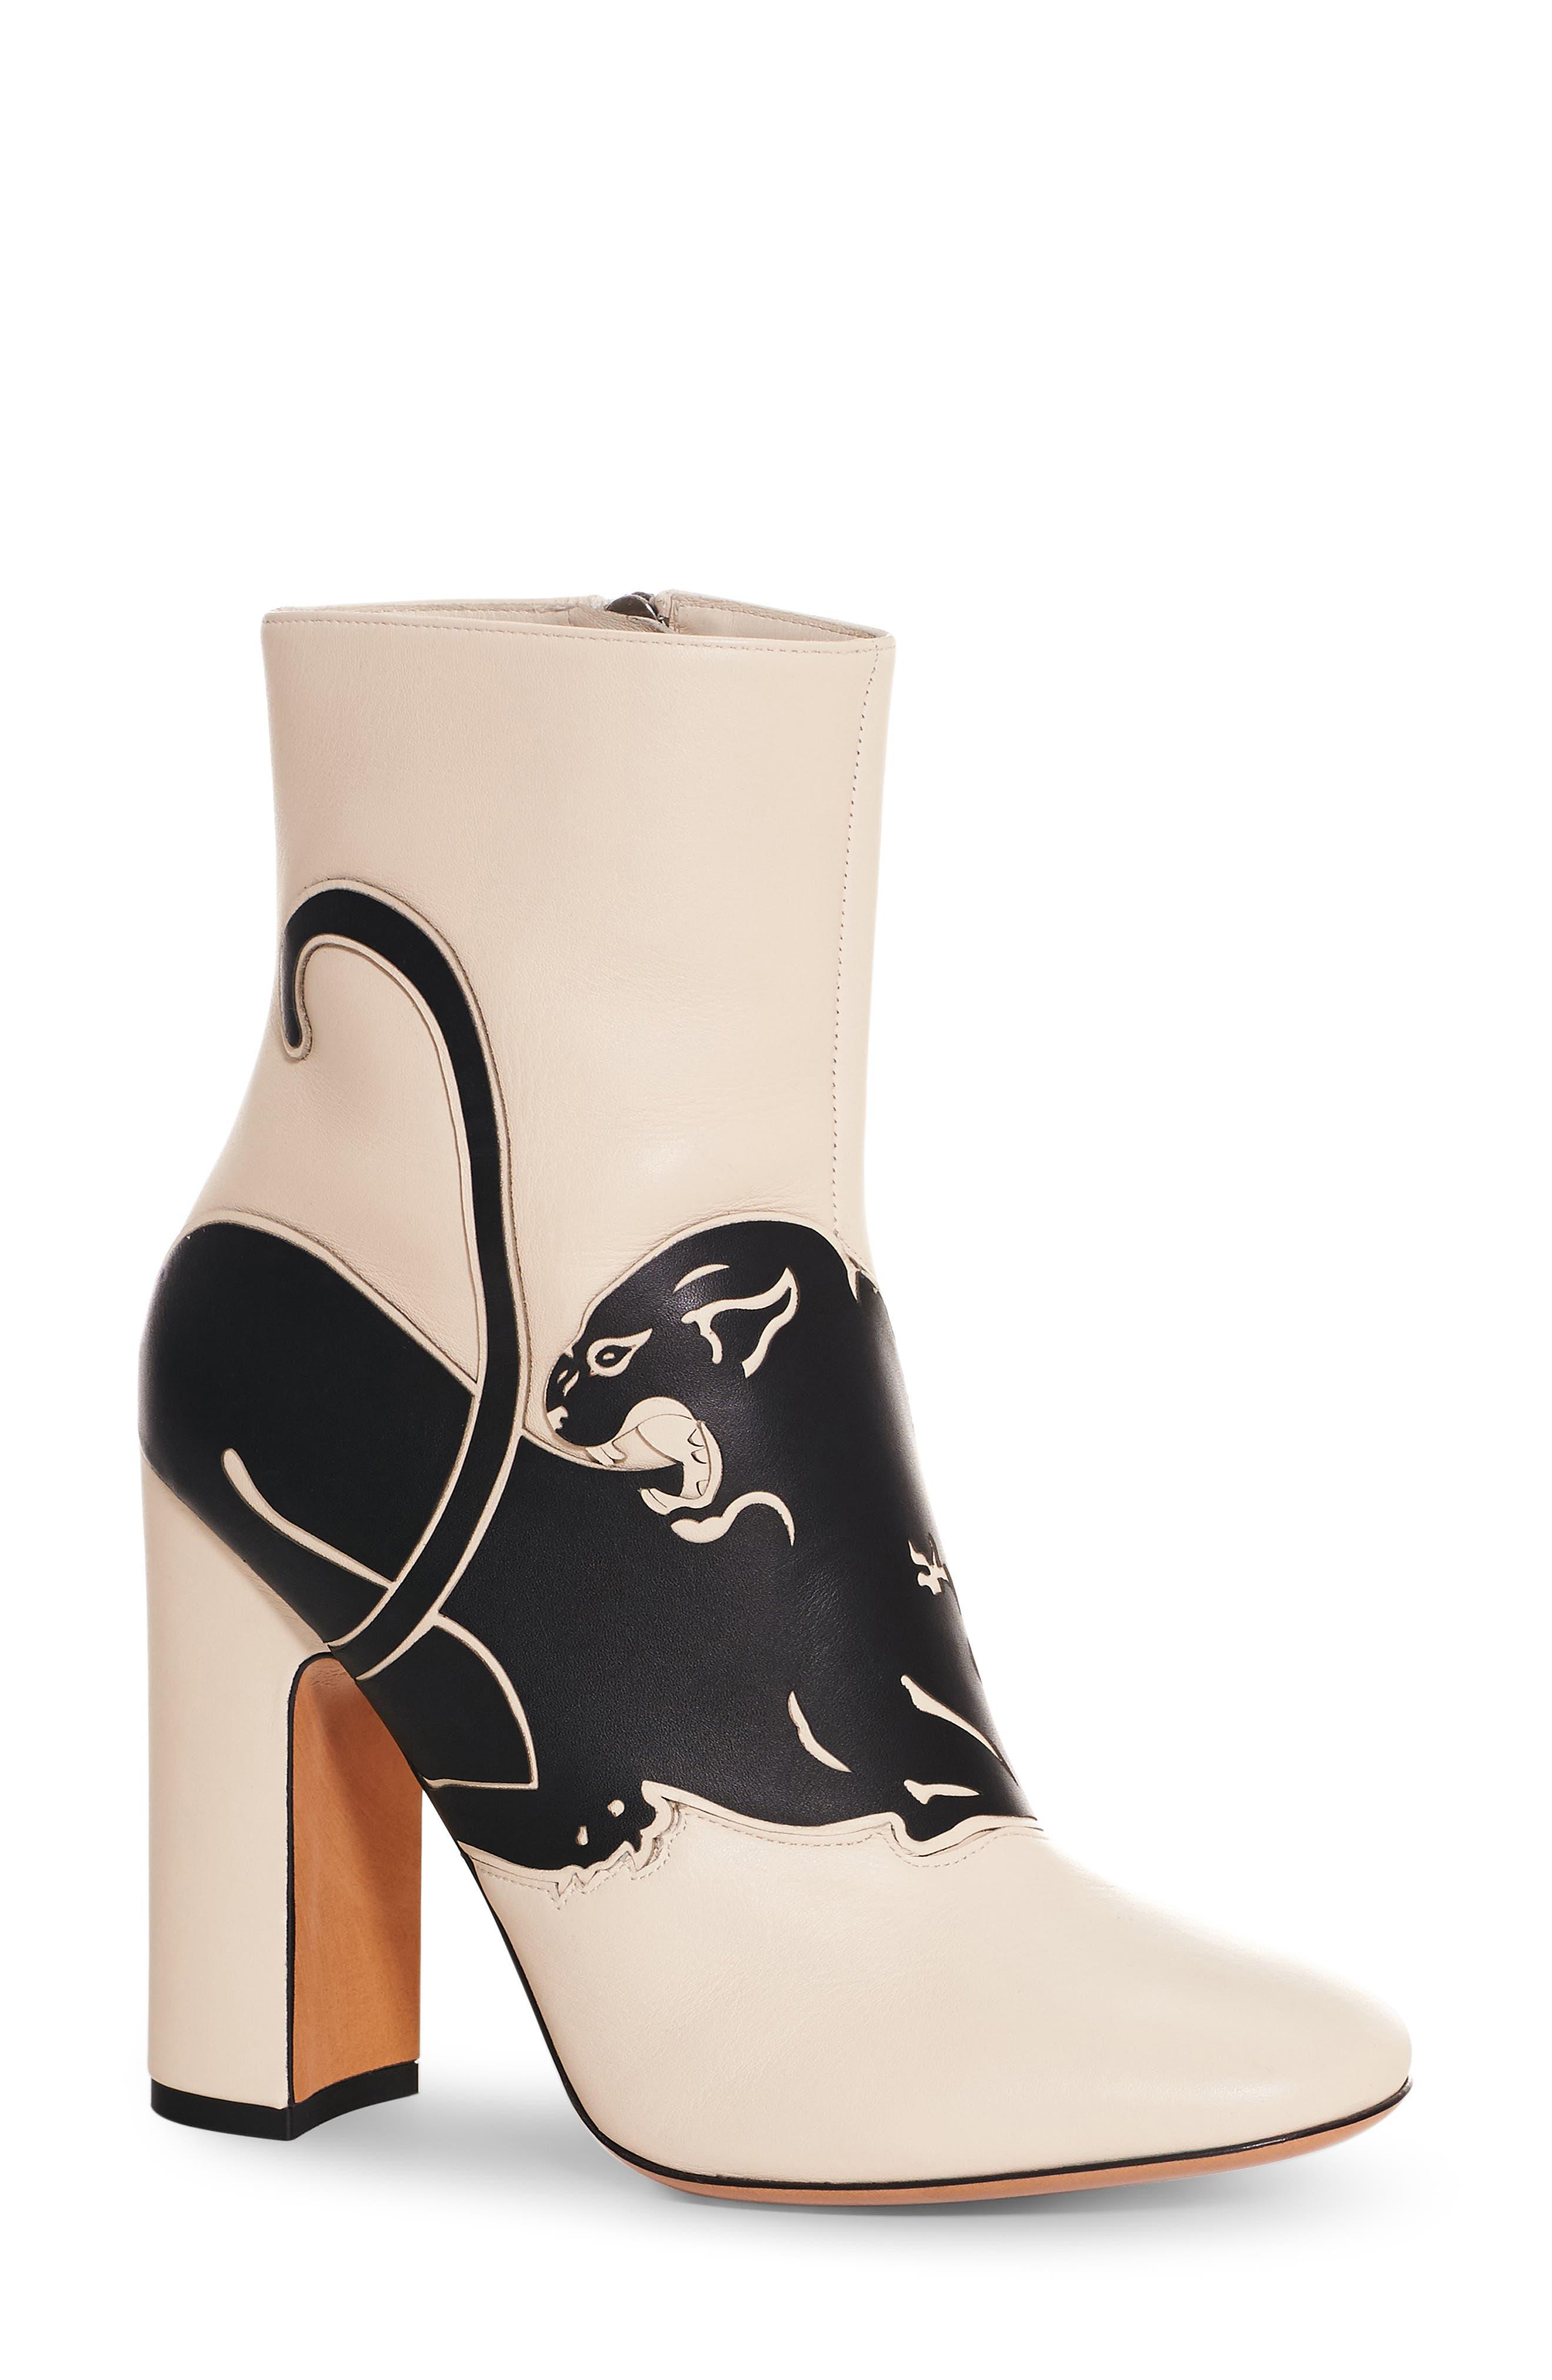 VALENTINO GARAVANI Panther Boot (Women)